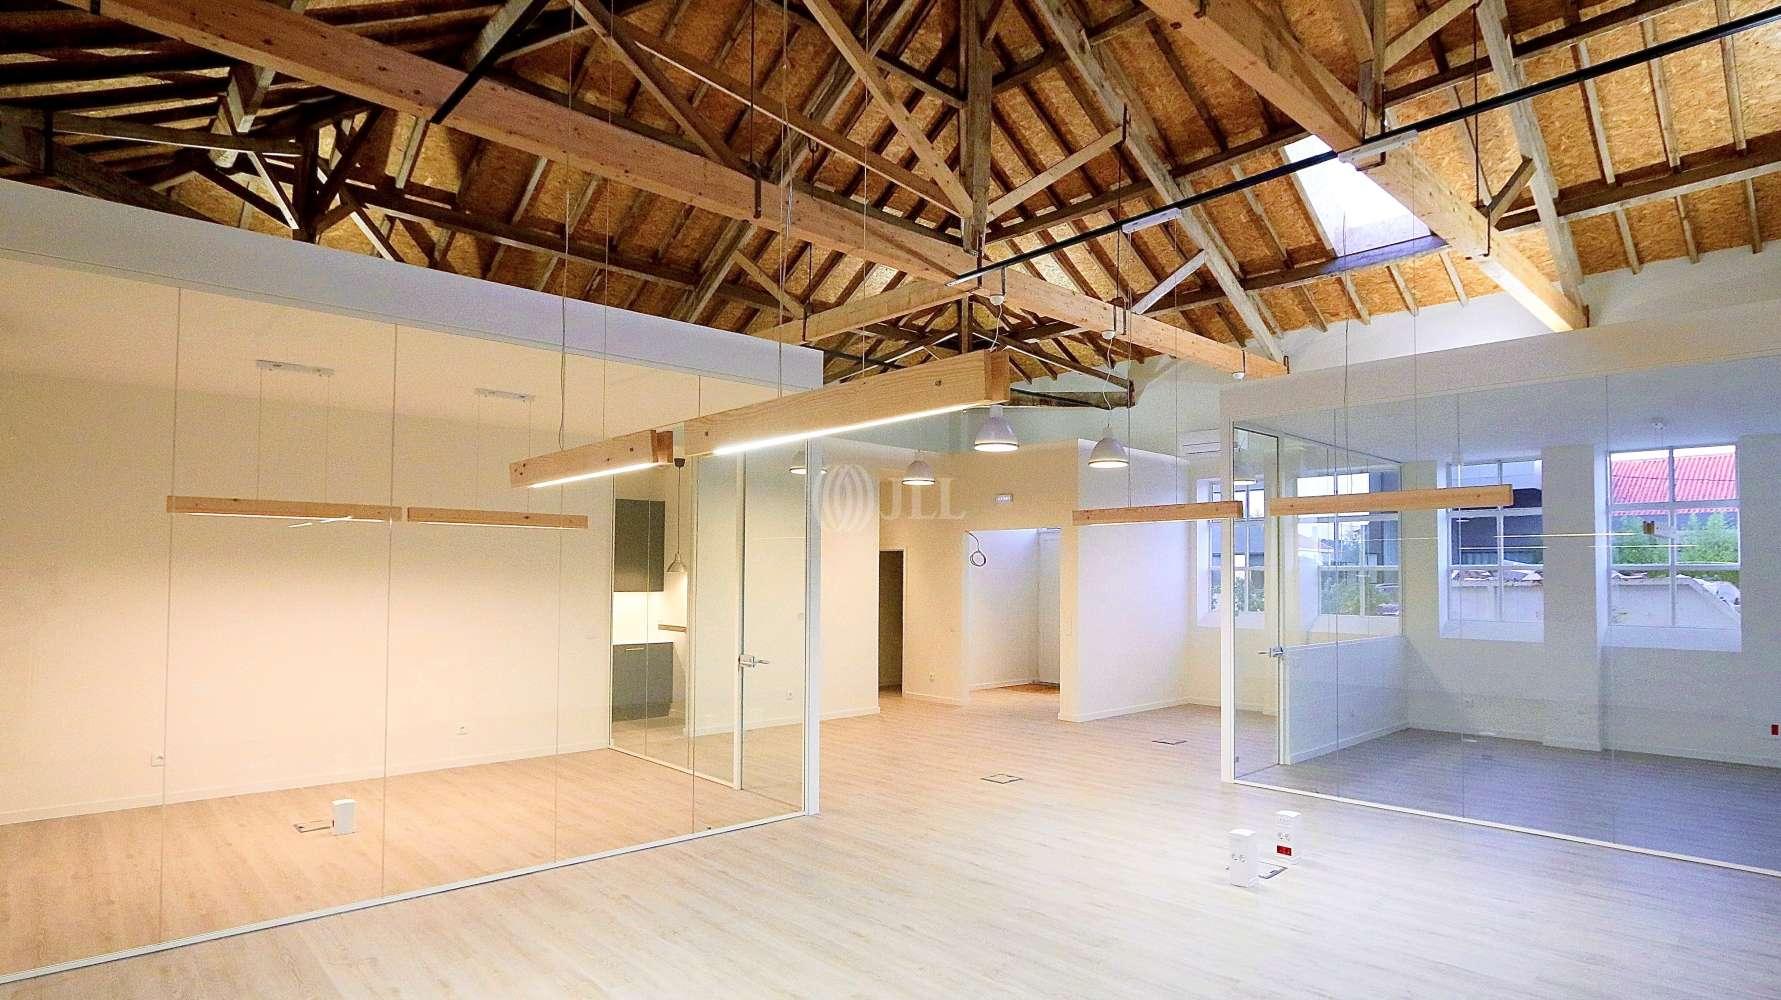 Escritórios Maia, 4470-116 - FABRIC - your vintage workspace